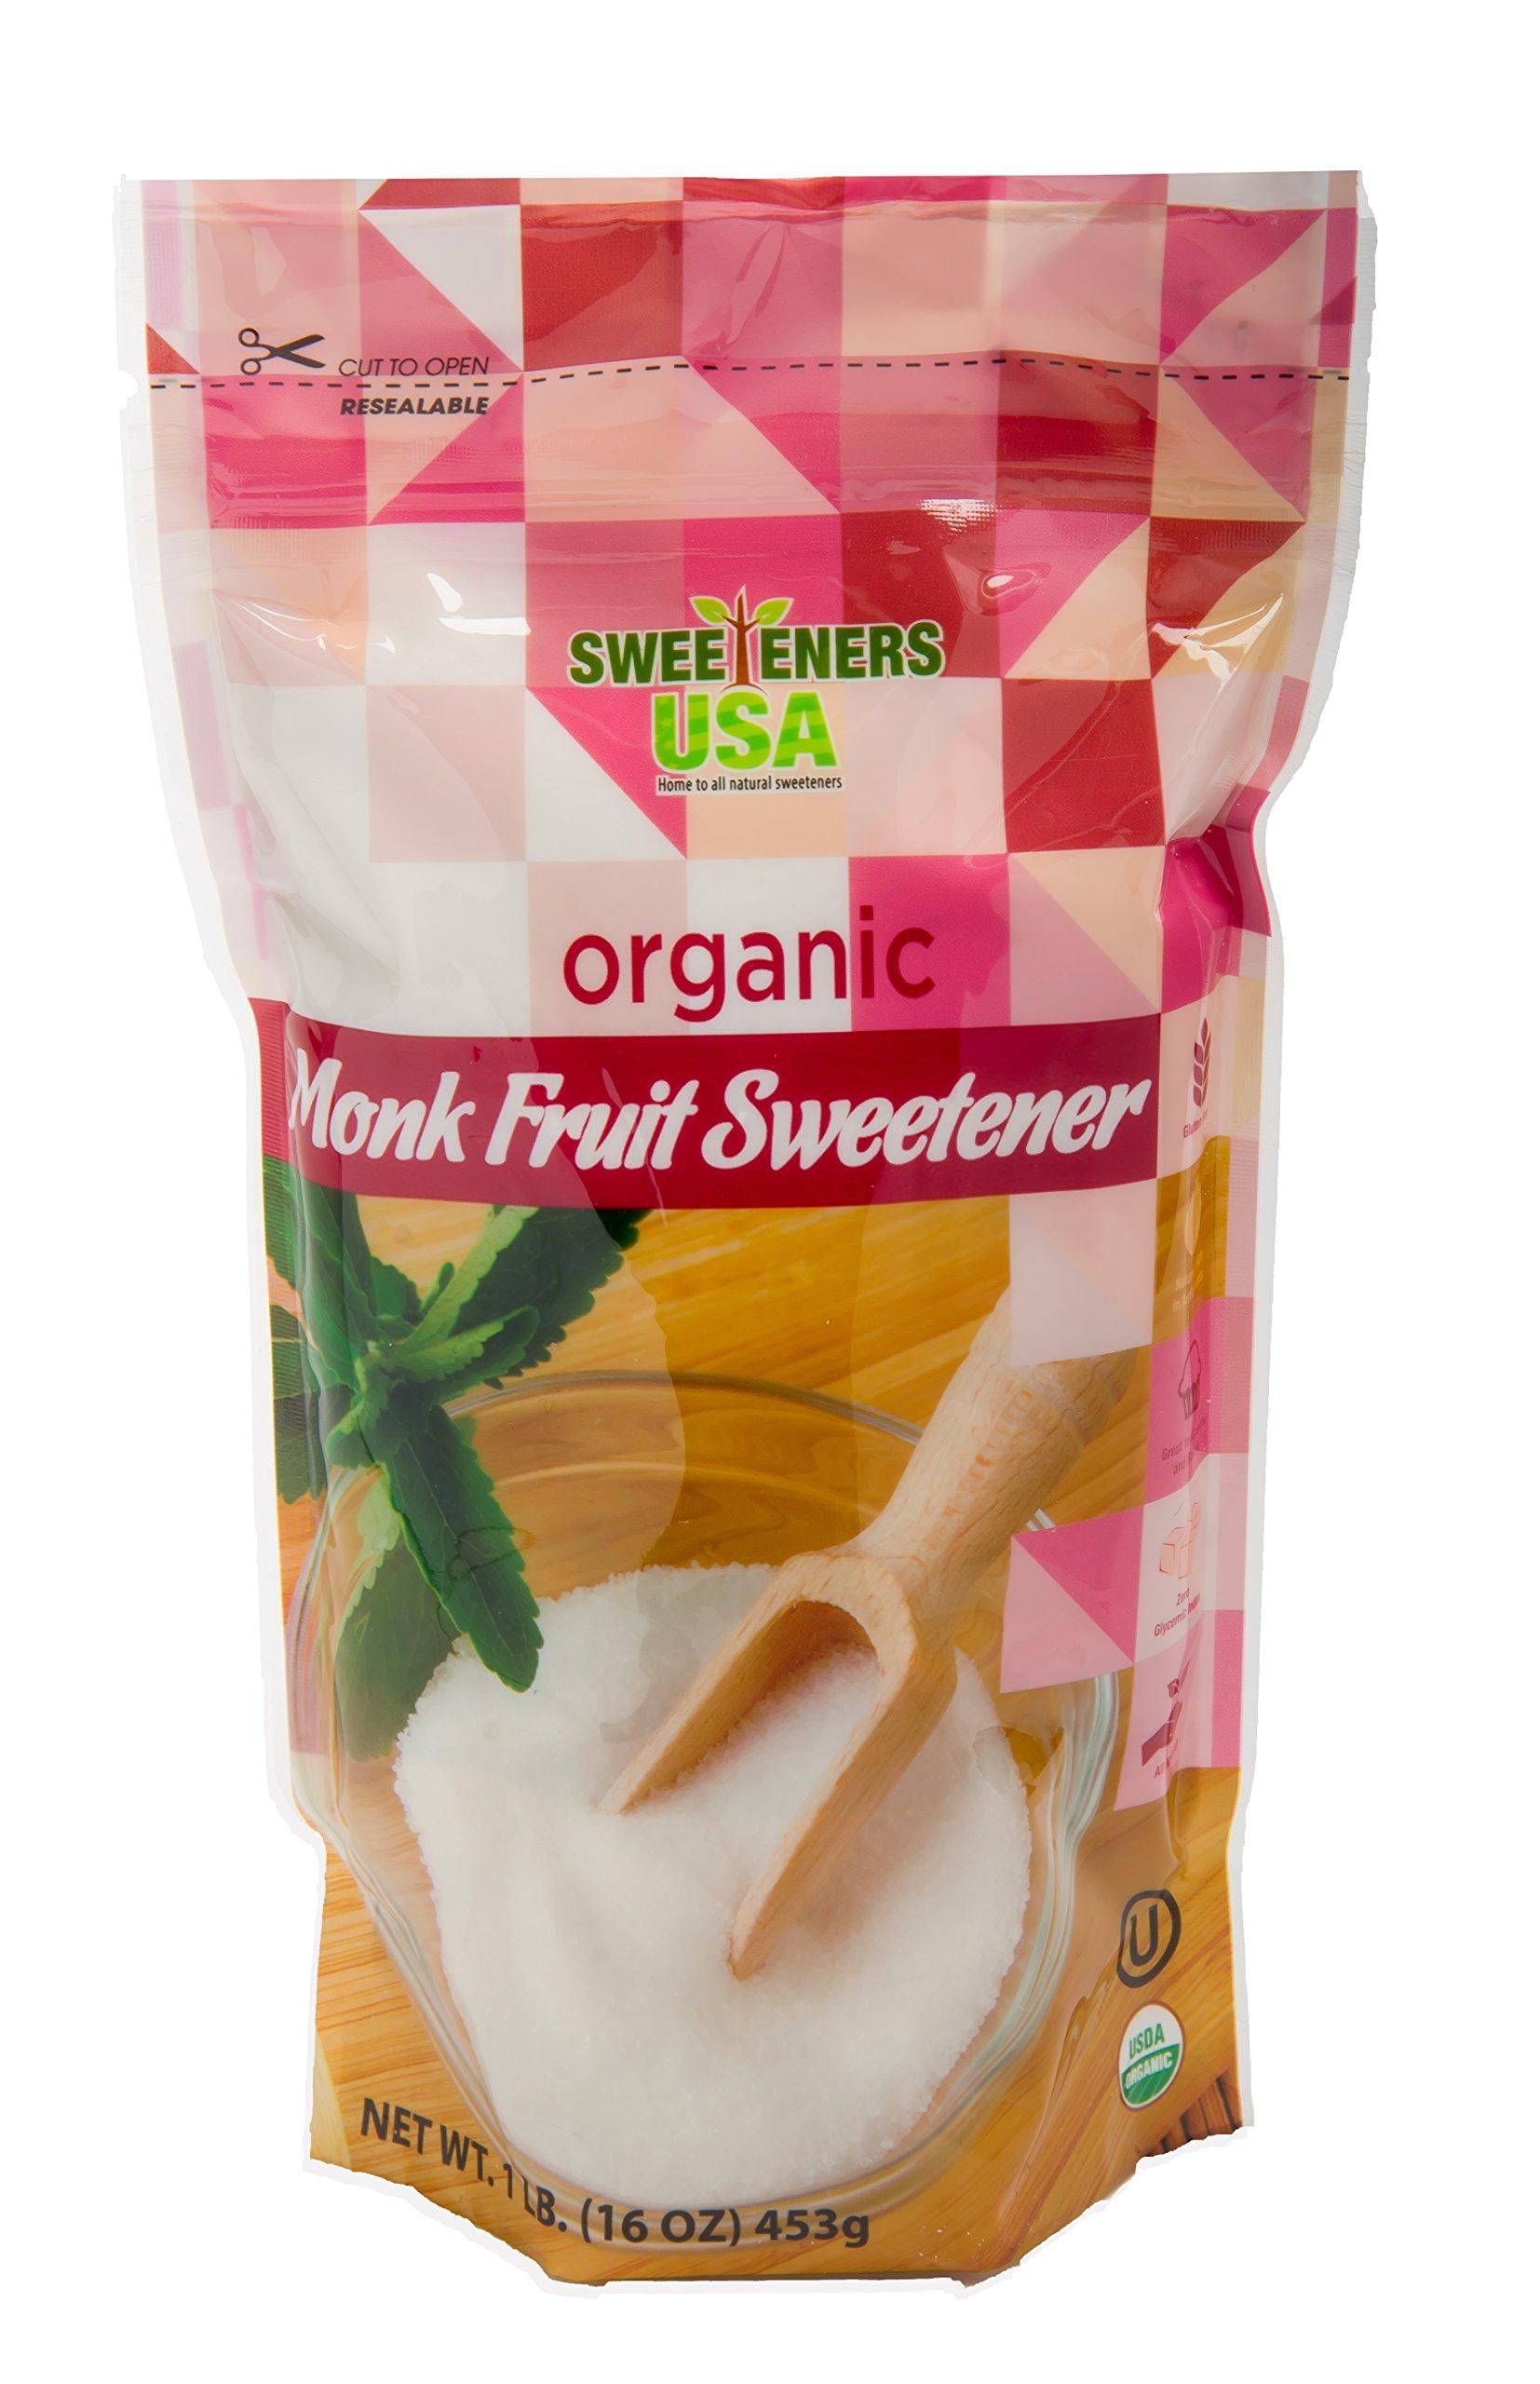 Sweeteners USA Organic Monk Fruit Sweetener 1 LB All Natural Sugar Substitute Classic White- NON GMO - Kosher Certified - GLUTEN FREE